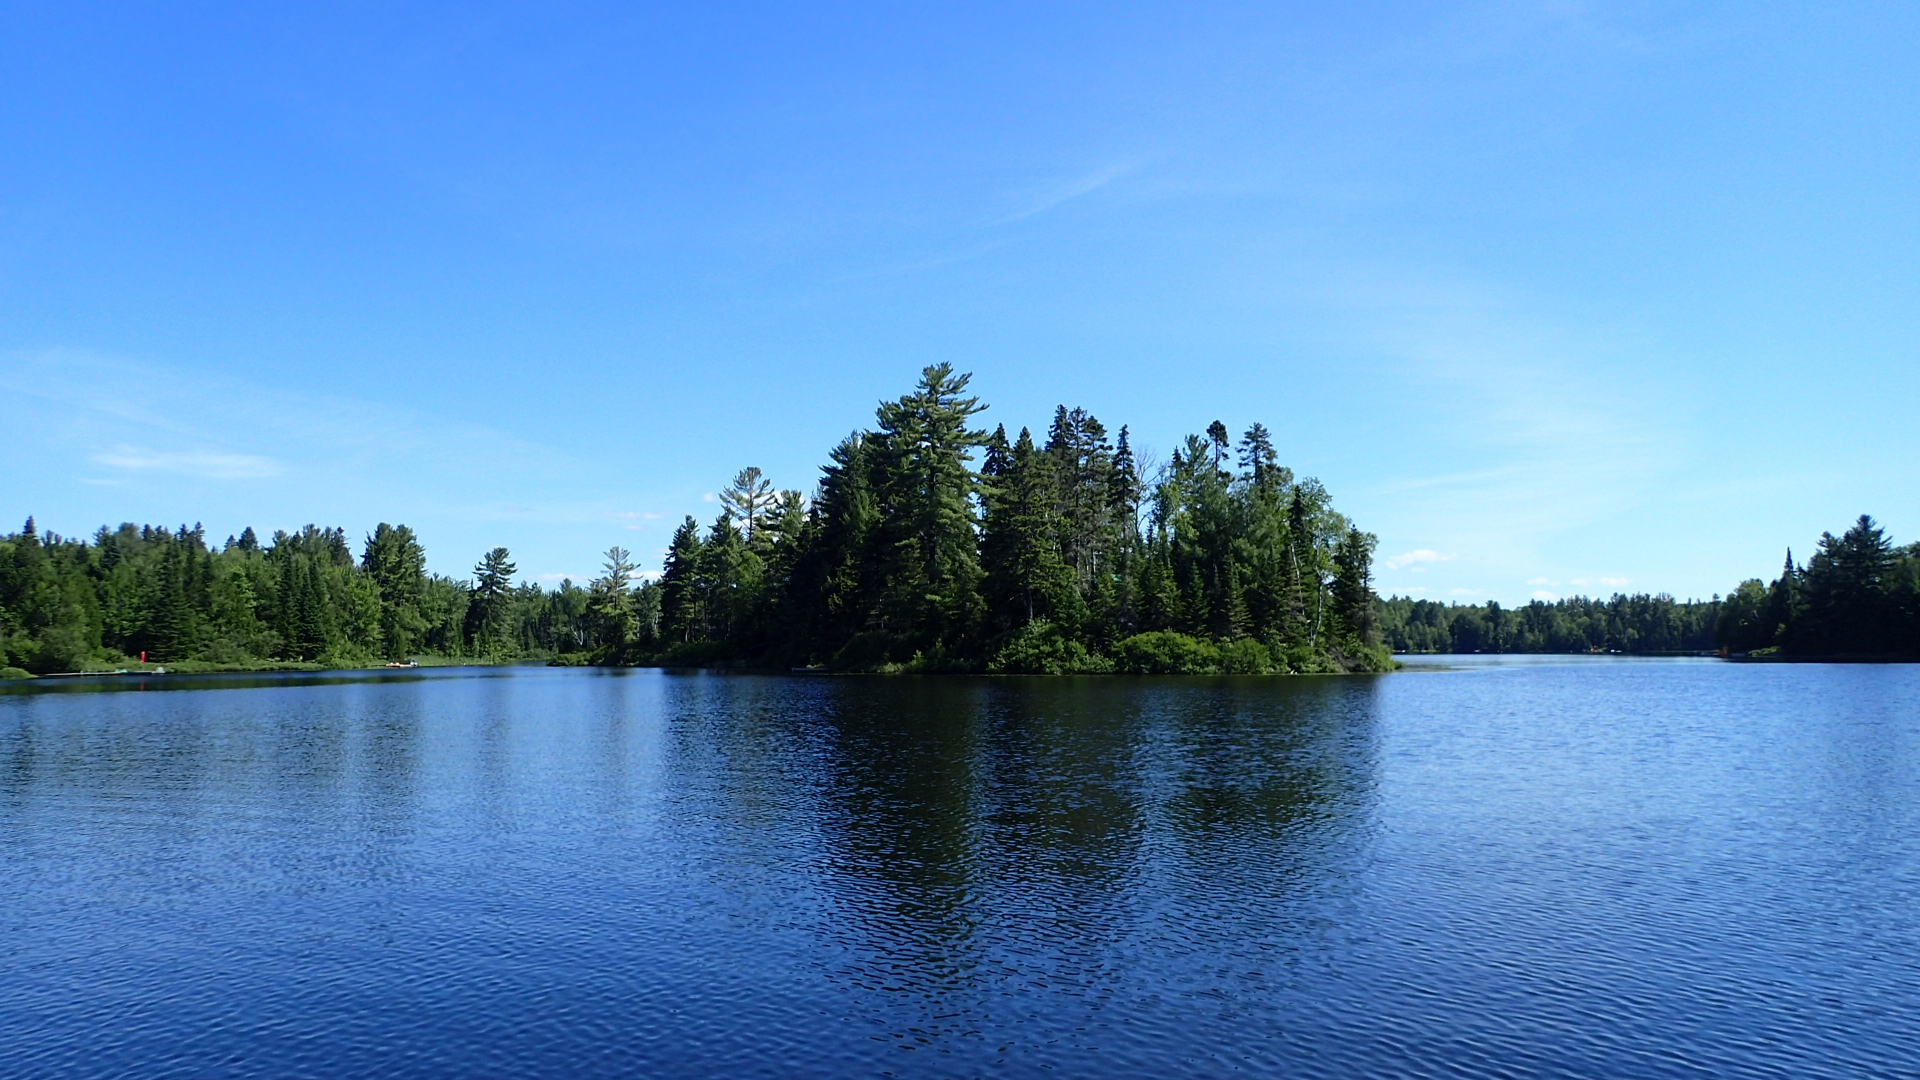 Association de lacs